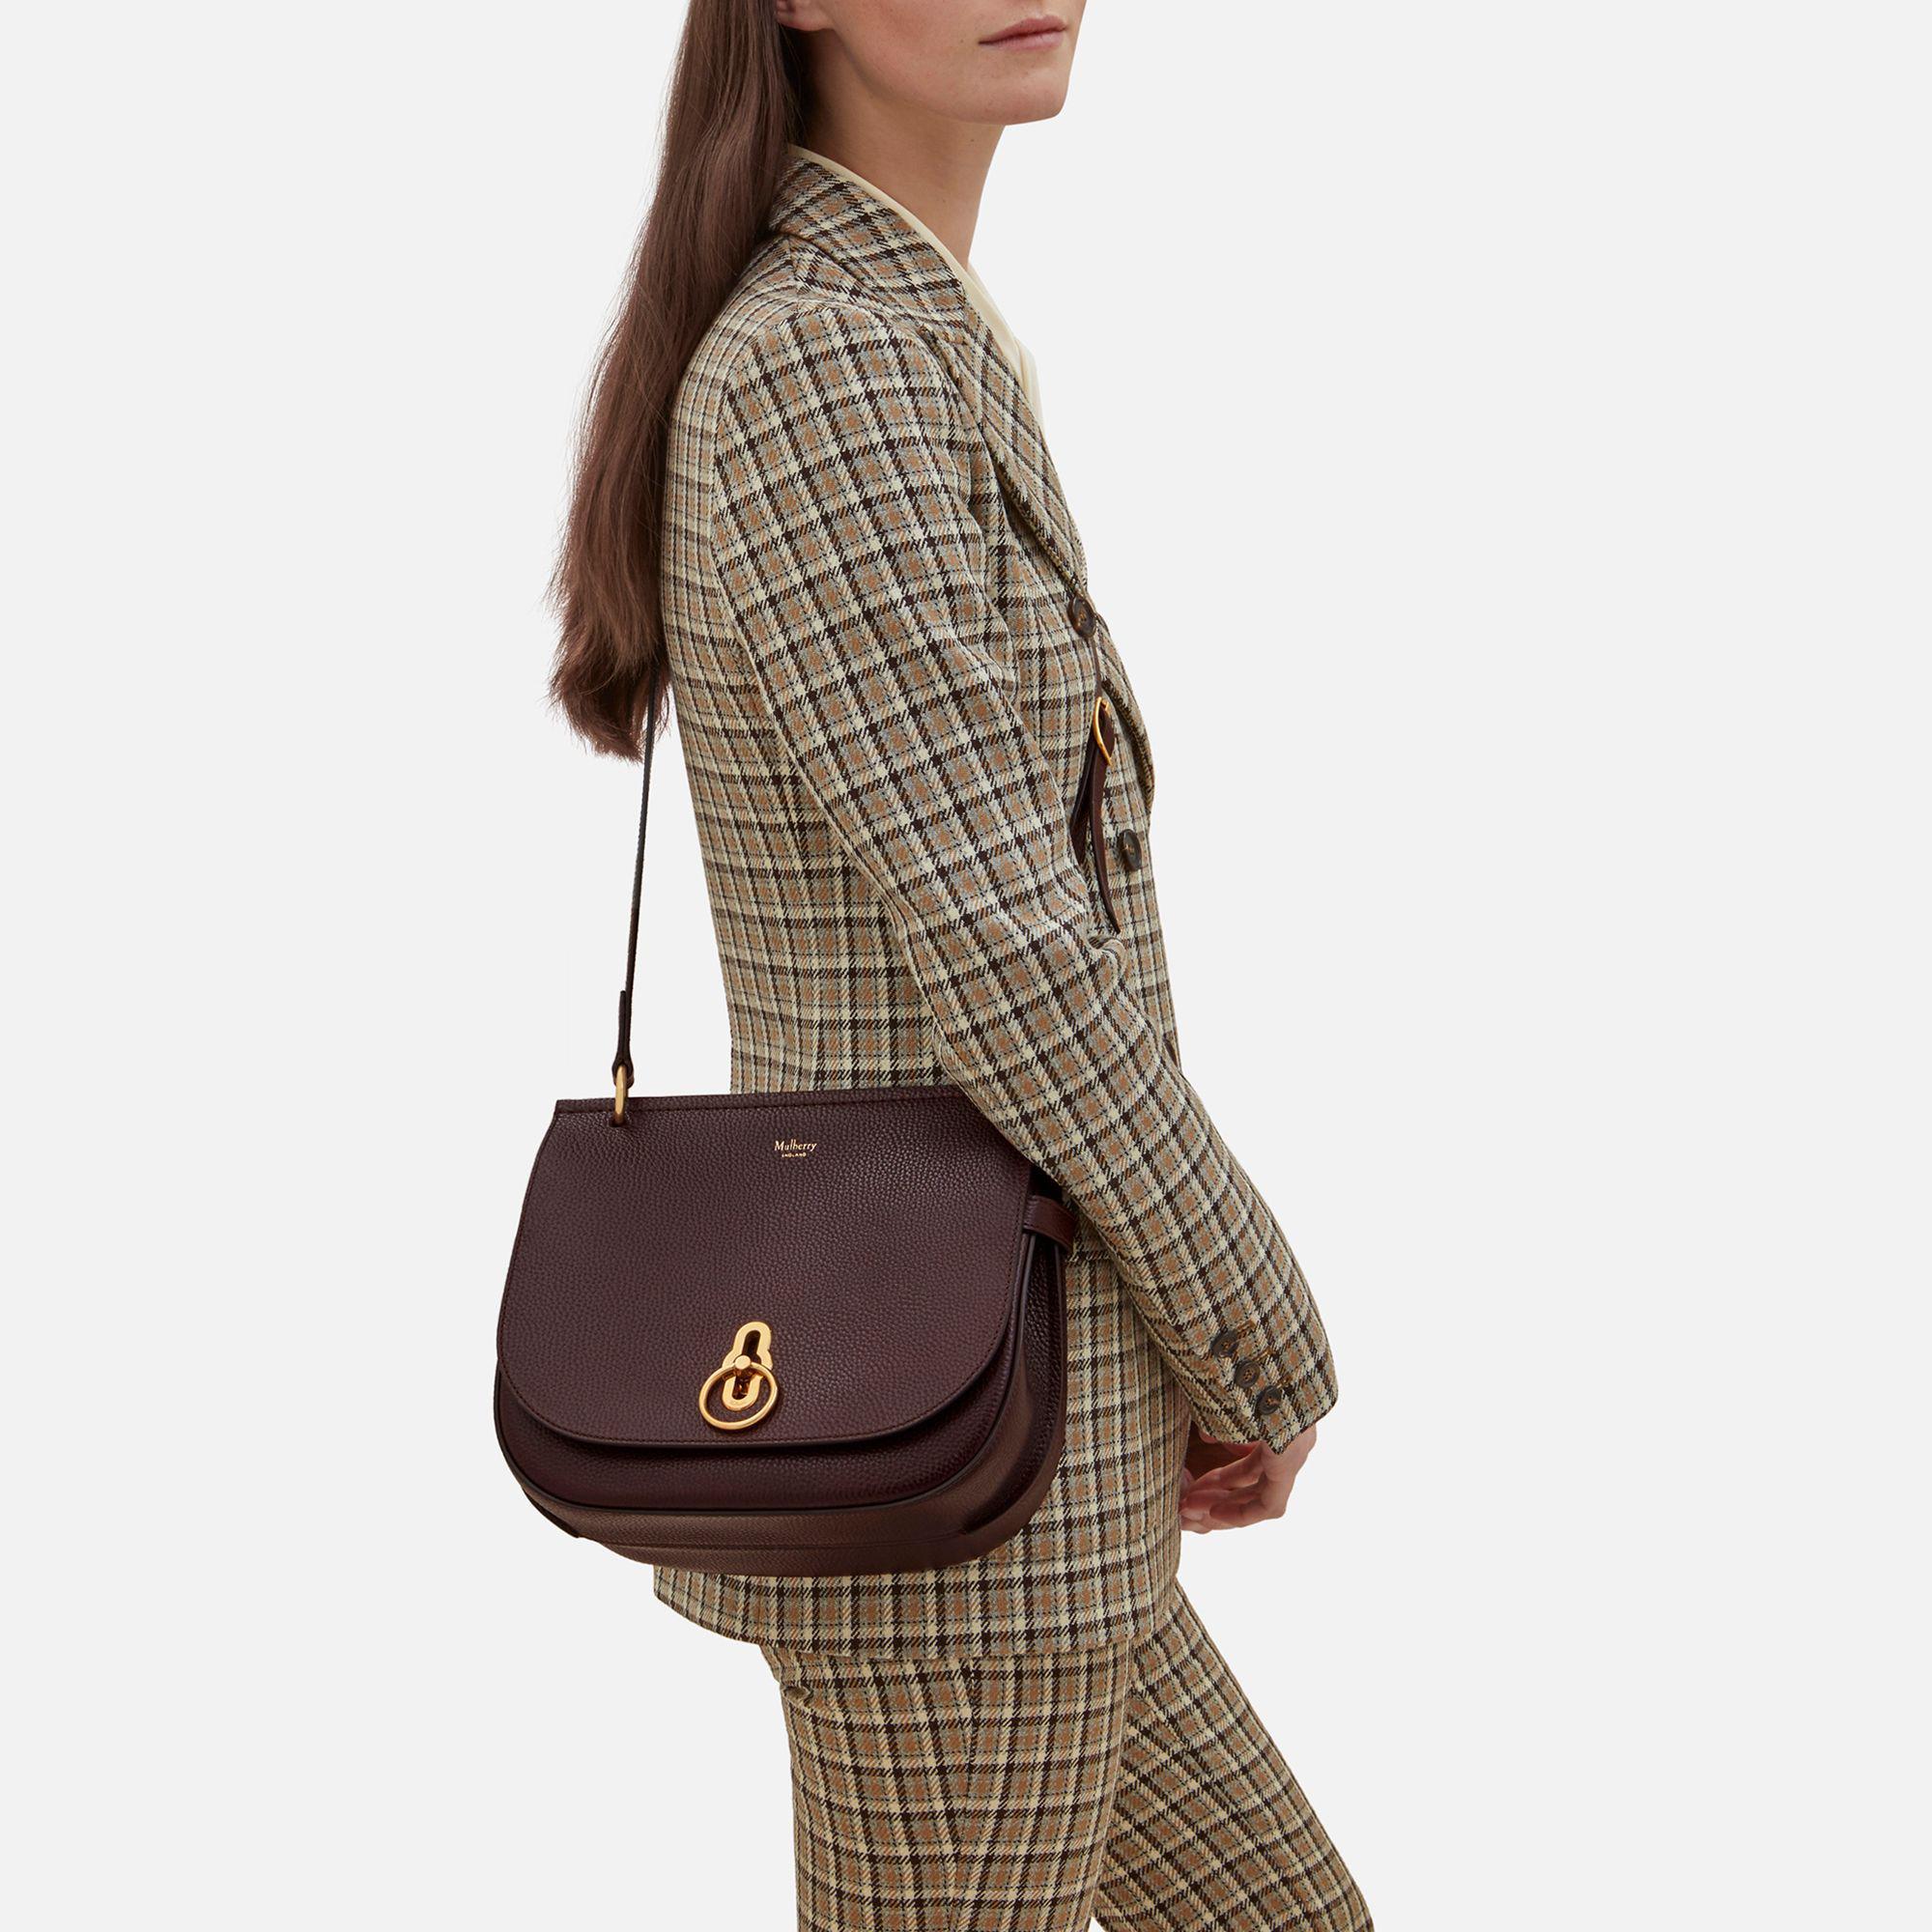 4e5c62ea5caa ... discount code for mulberry brown amberley satchel lyst. view fullscreen  fd4e2 52b13